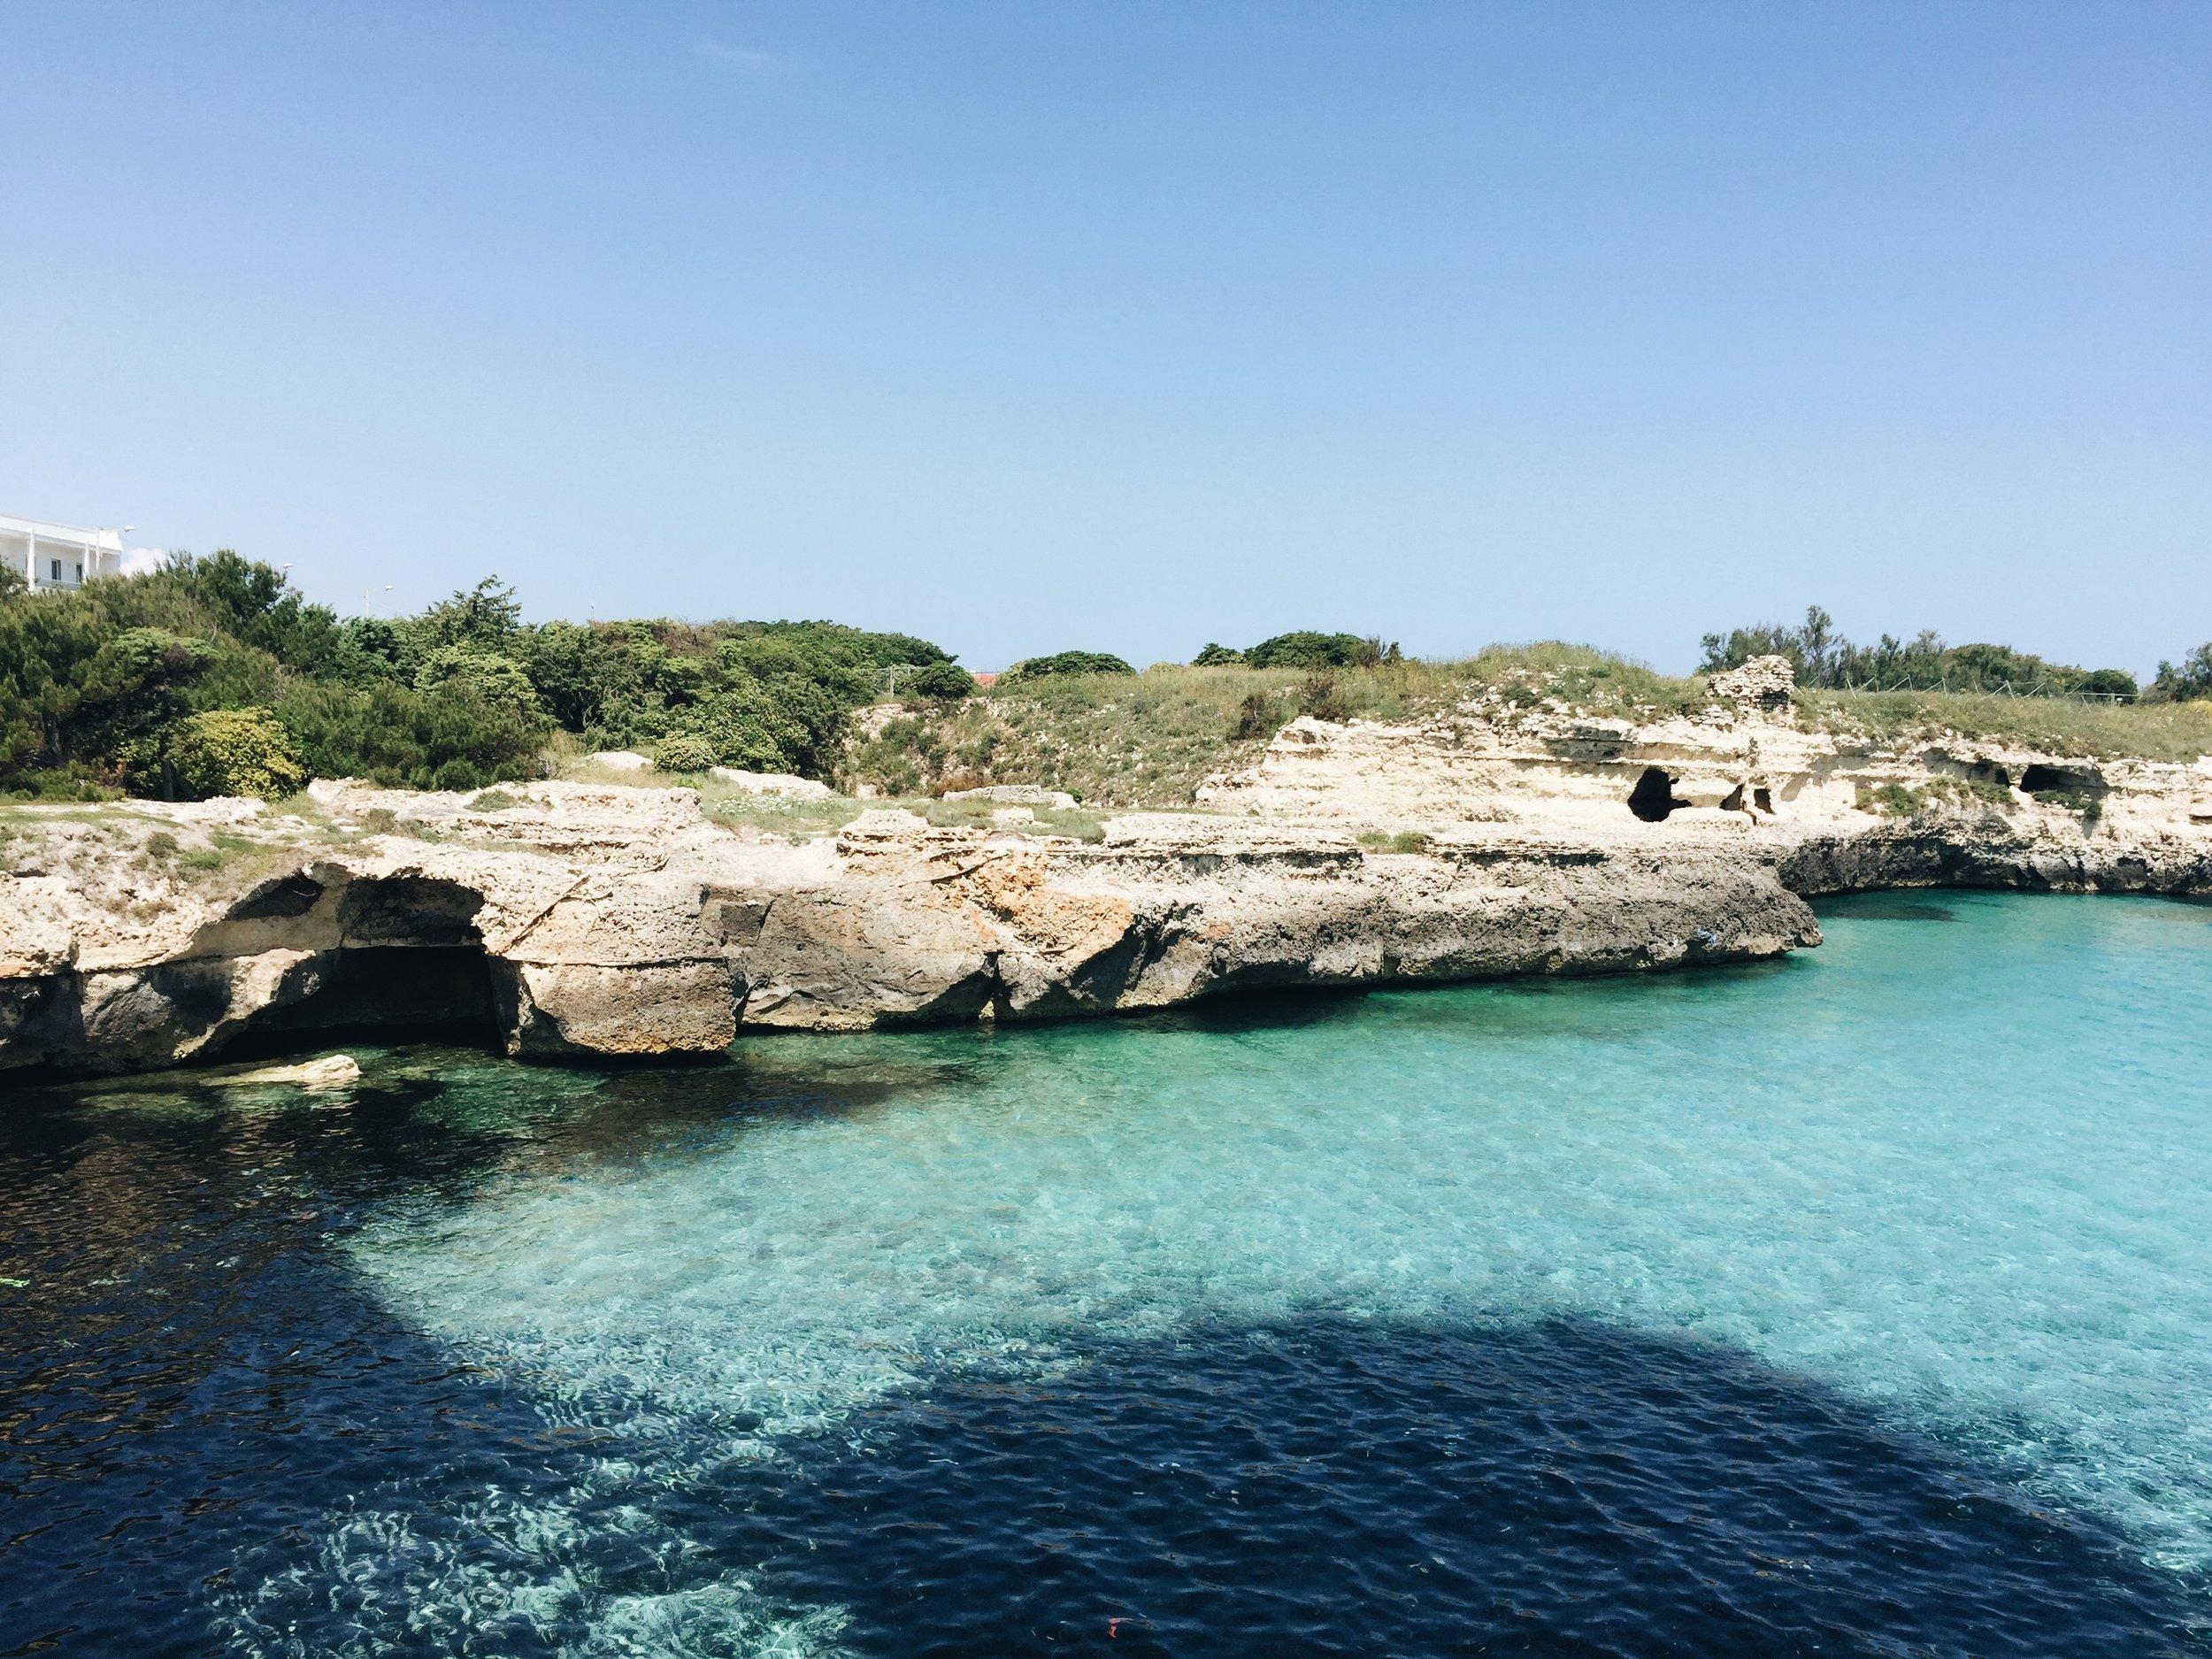 roca-italie-salento-onmywayblog.JPG